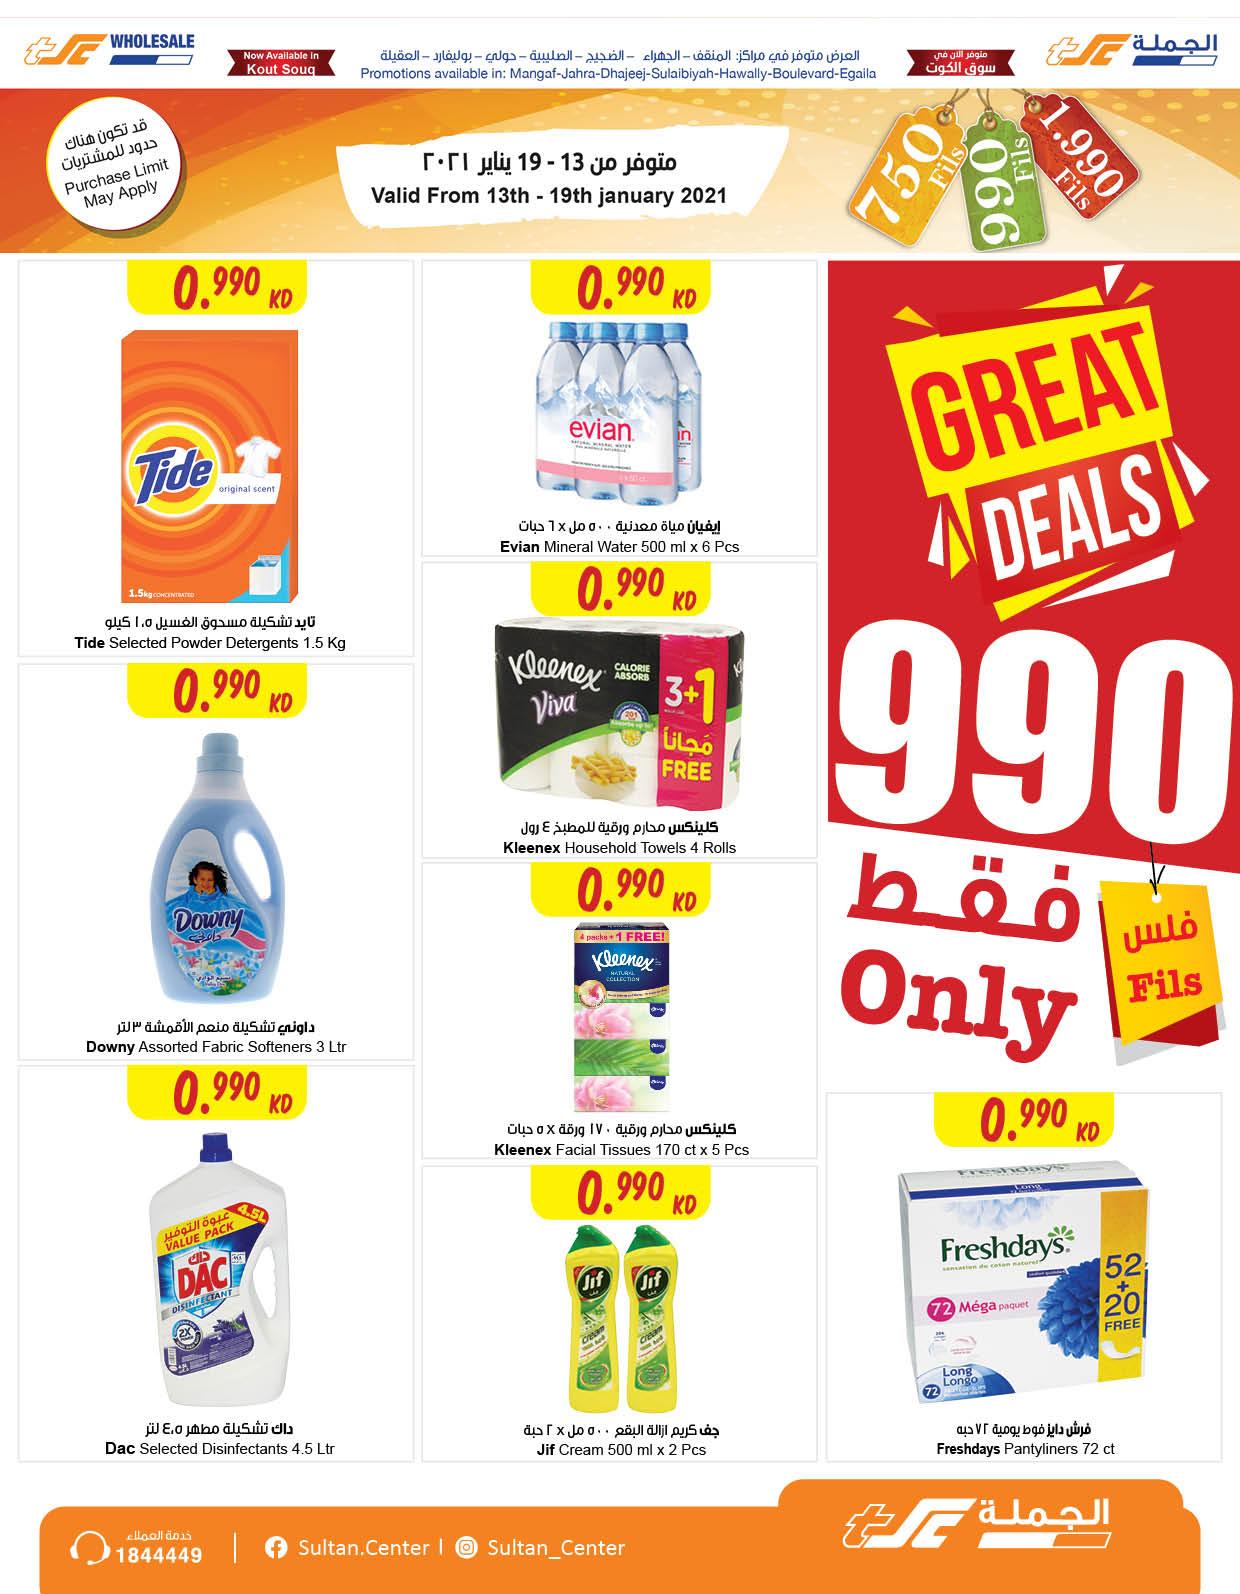 Sultan Center Weekly promotions, iiQ8, Deals in Sultan Centre Kuwait Jan 2021 10